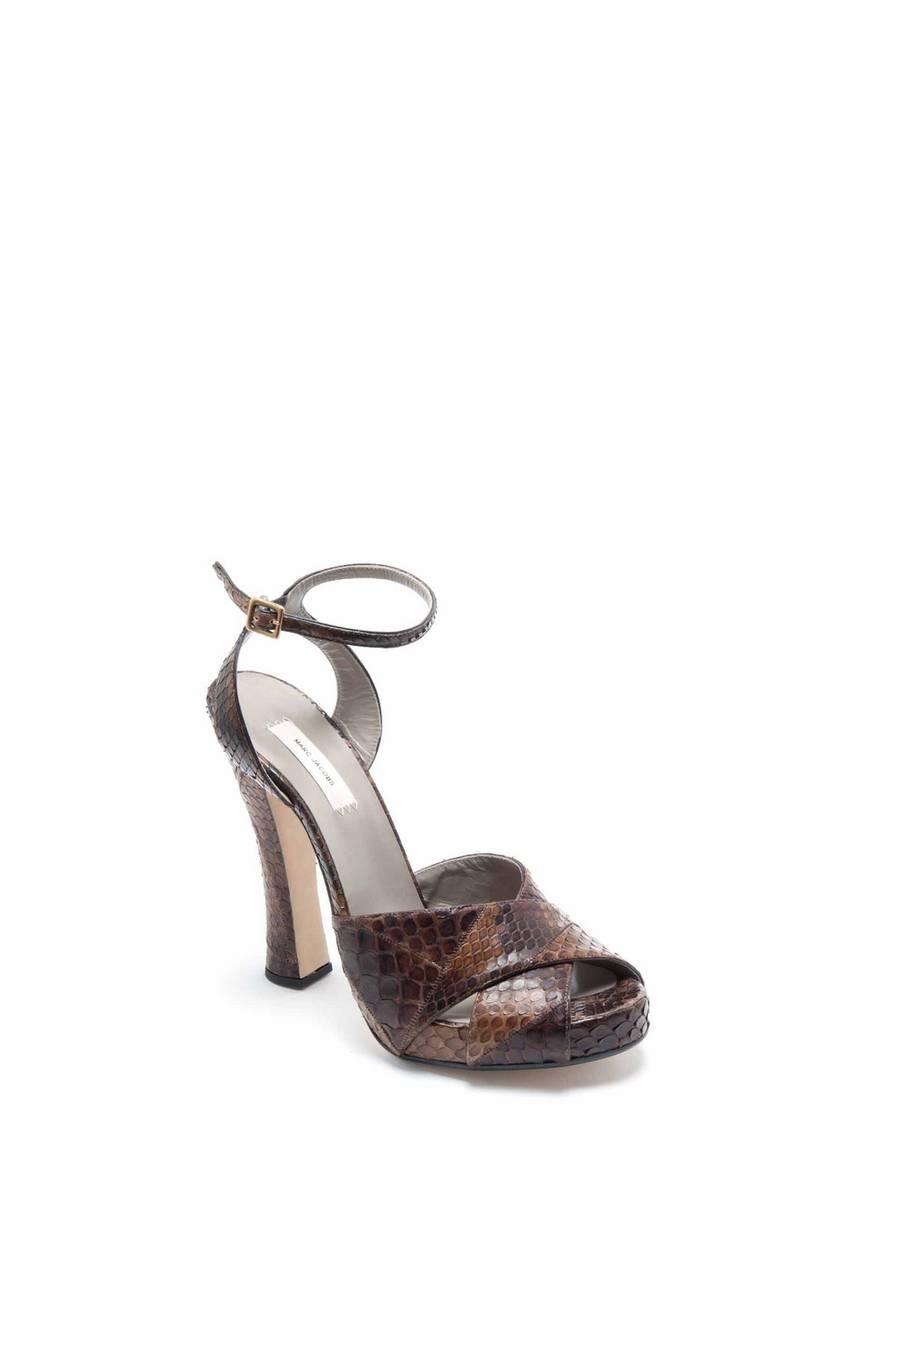 6150ddd8357103 Python Sandal In Brown - Lookbook - Marc Jacobs